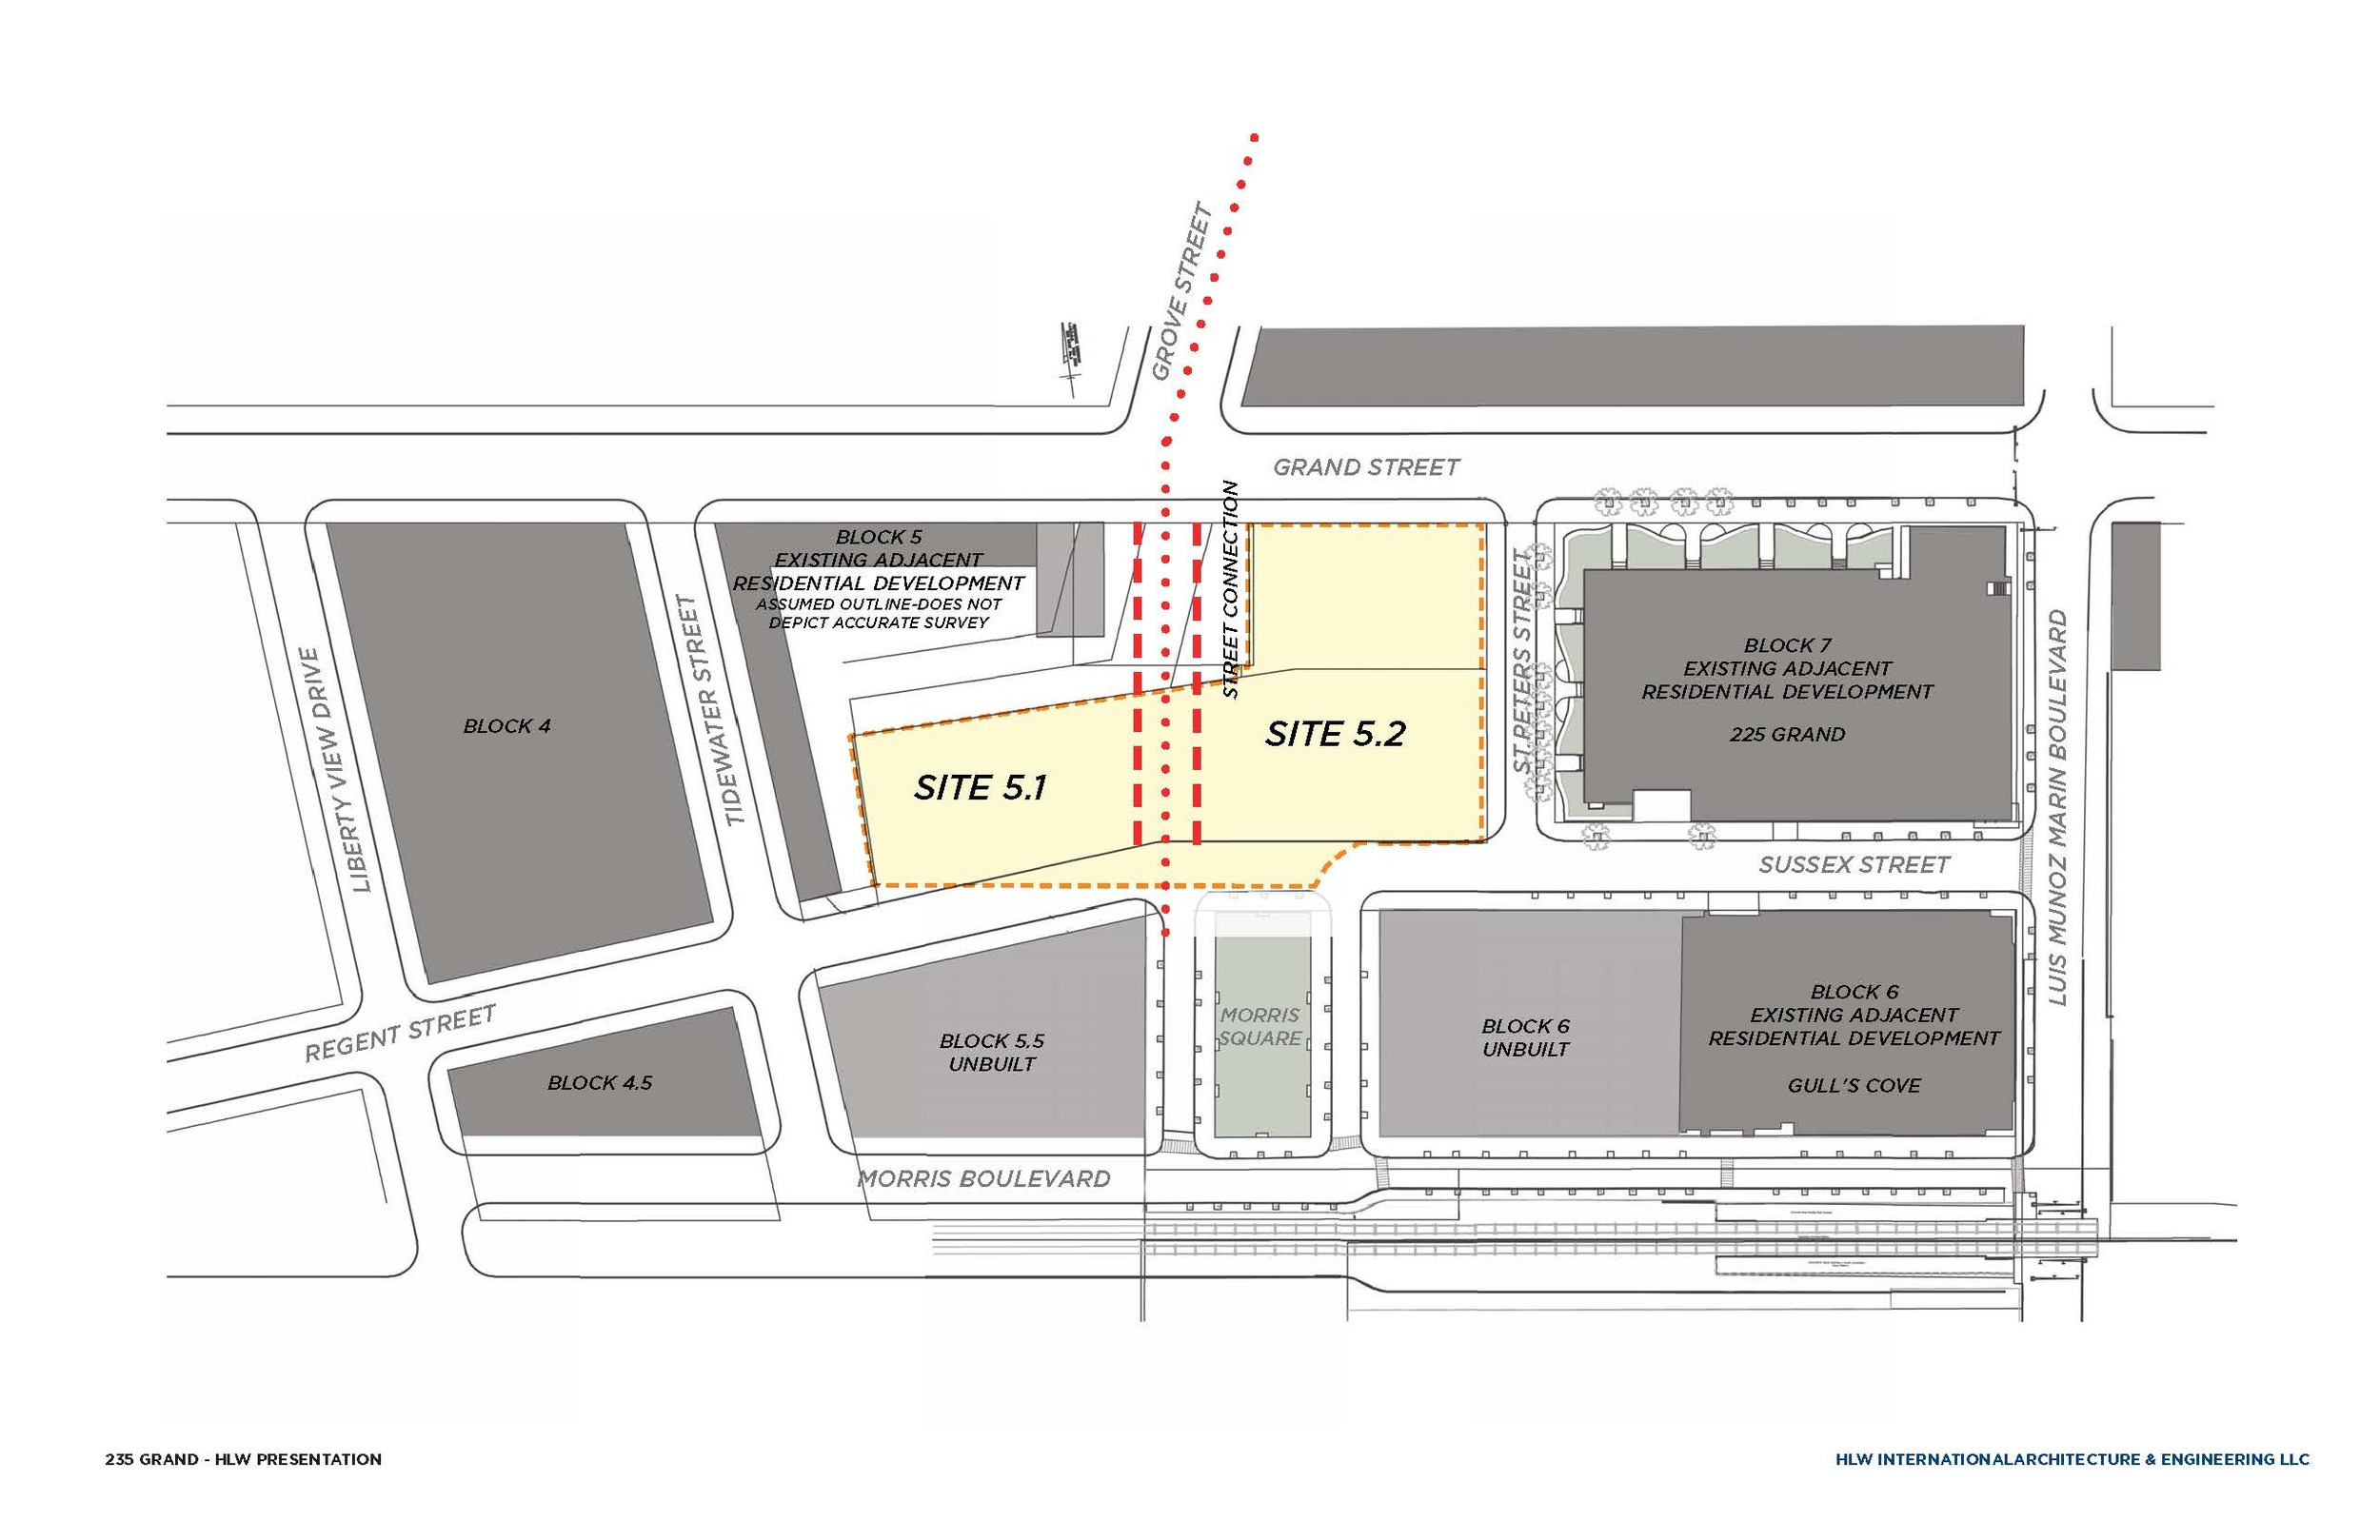 block 5 redevelopment-1